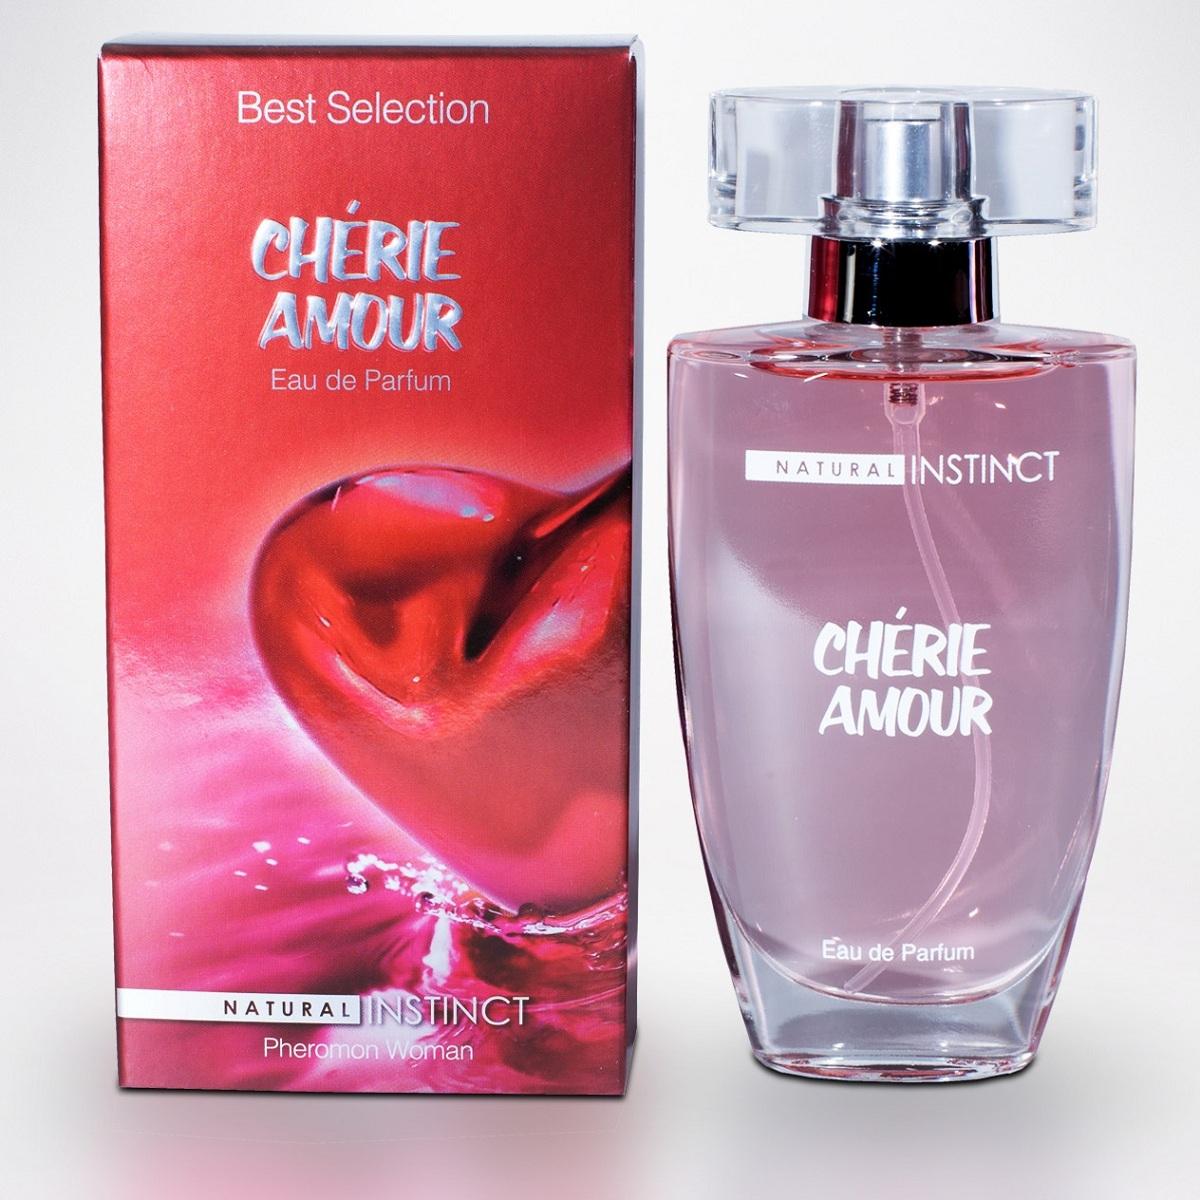 Духи и смазки для женщин: Женские духи с феромонами Natural Instinct Cherie Amour - 50 мл.